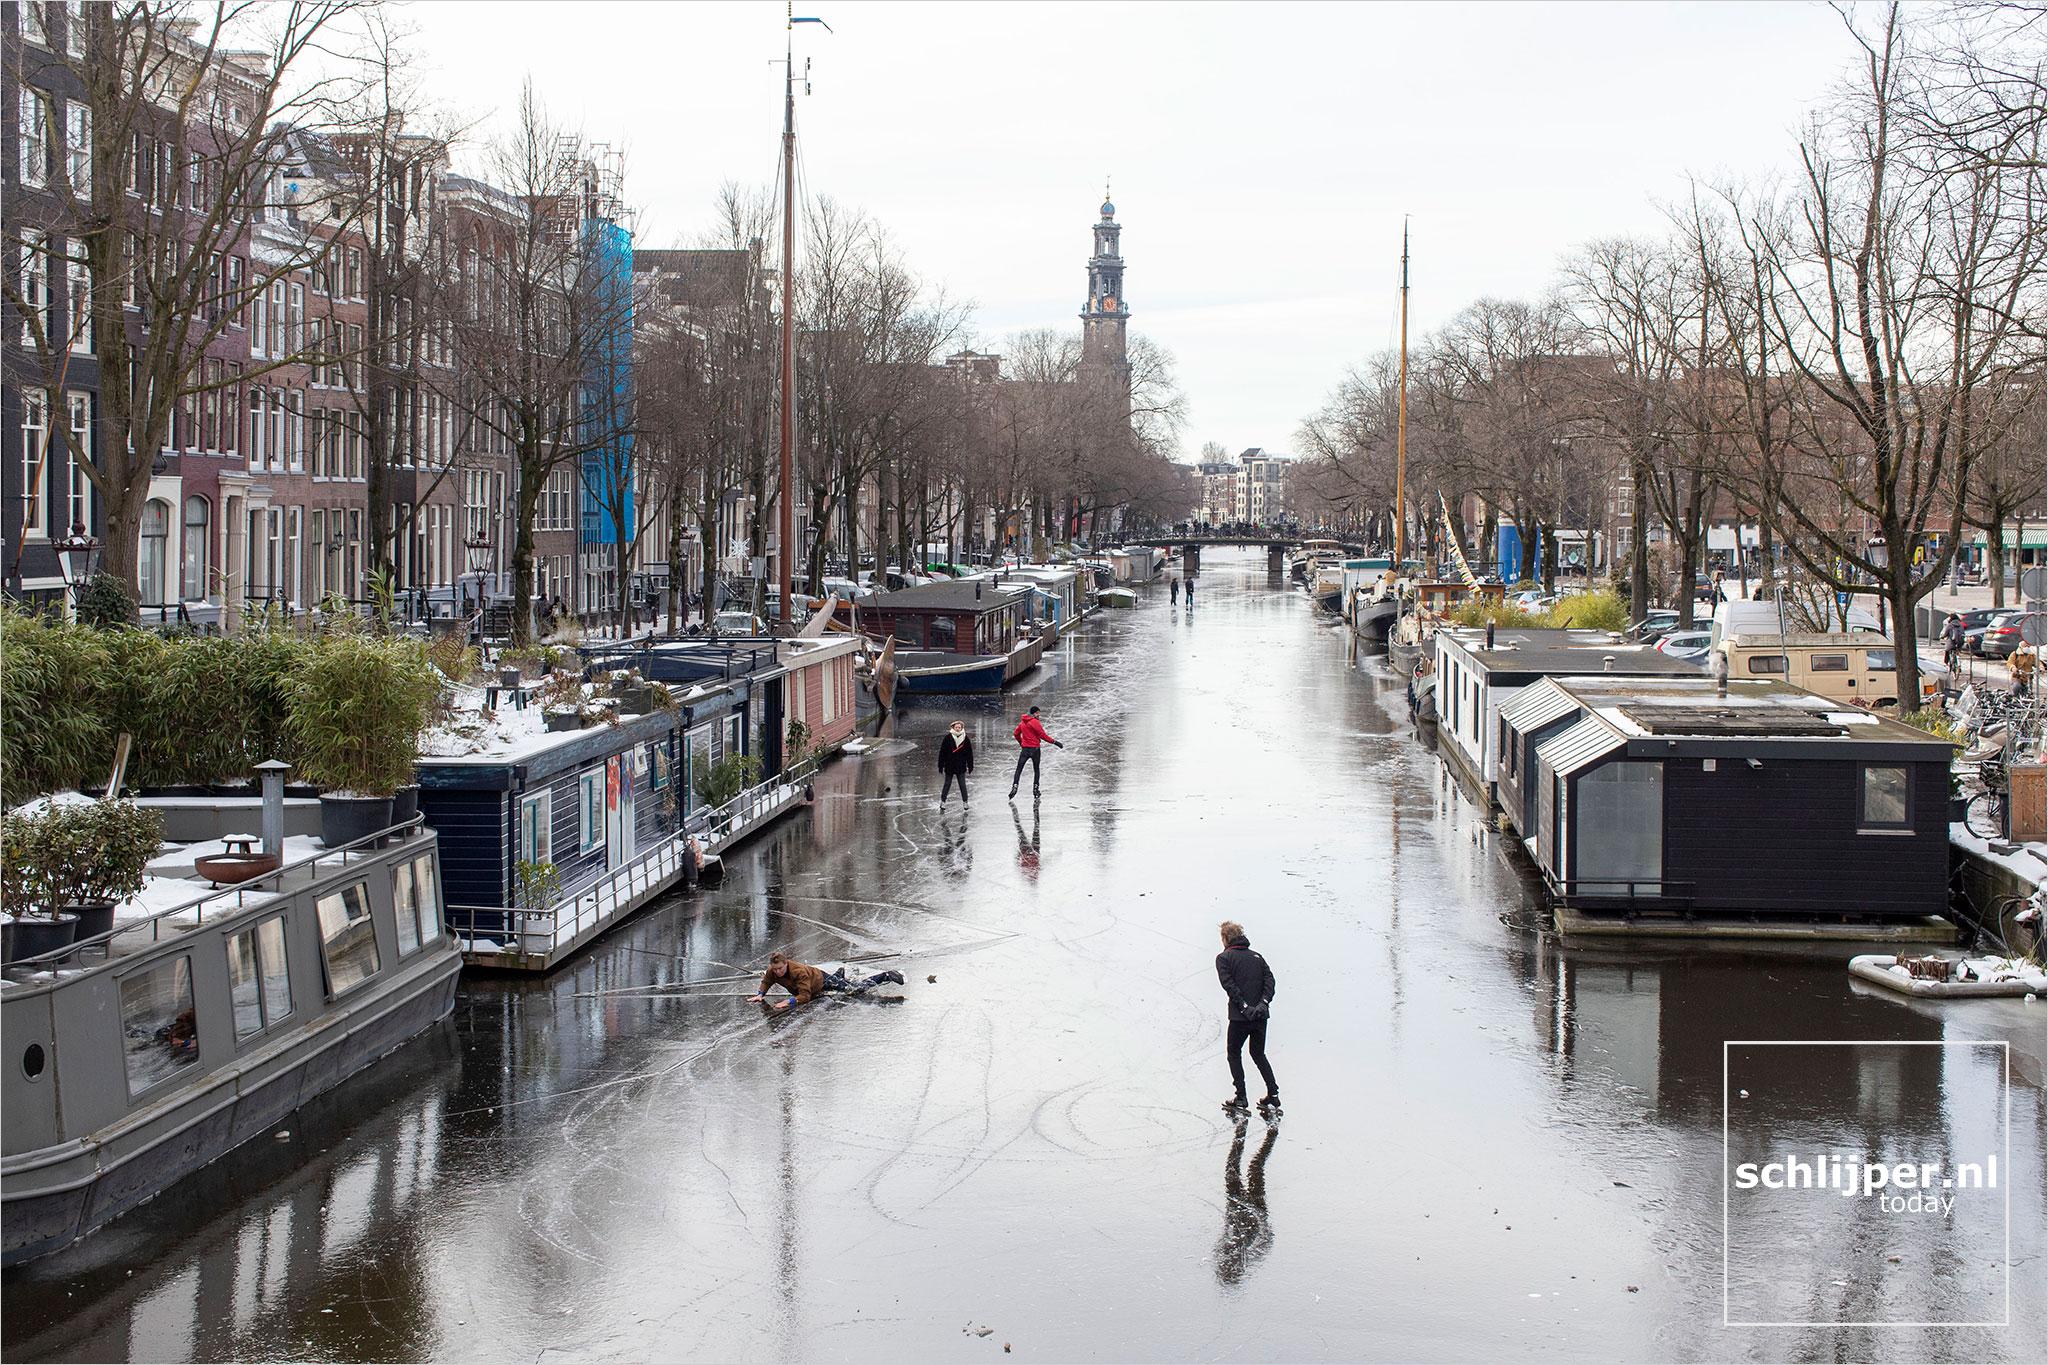 The Netherlands, Amsterdam, 14 februari 2021